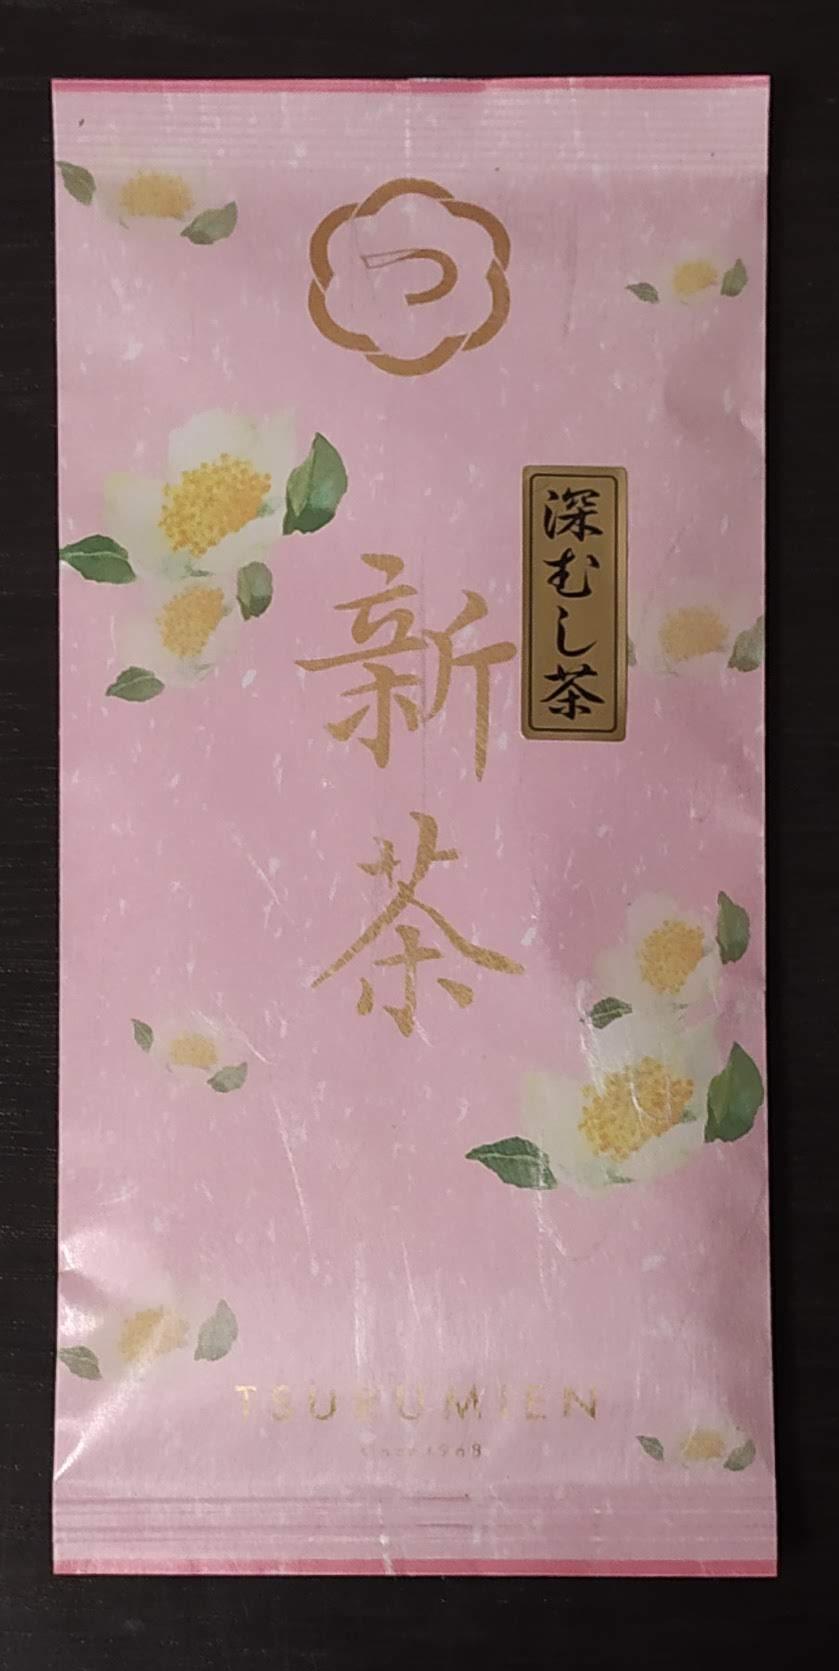 2020鹿児島新茶【特上】深蒸し煎茶75g袋入(K-107F)